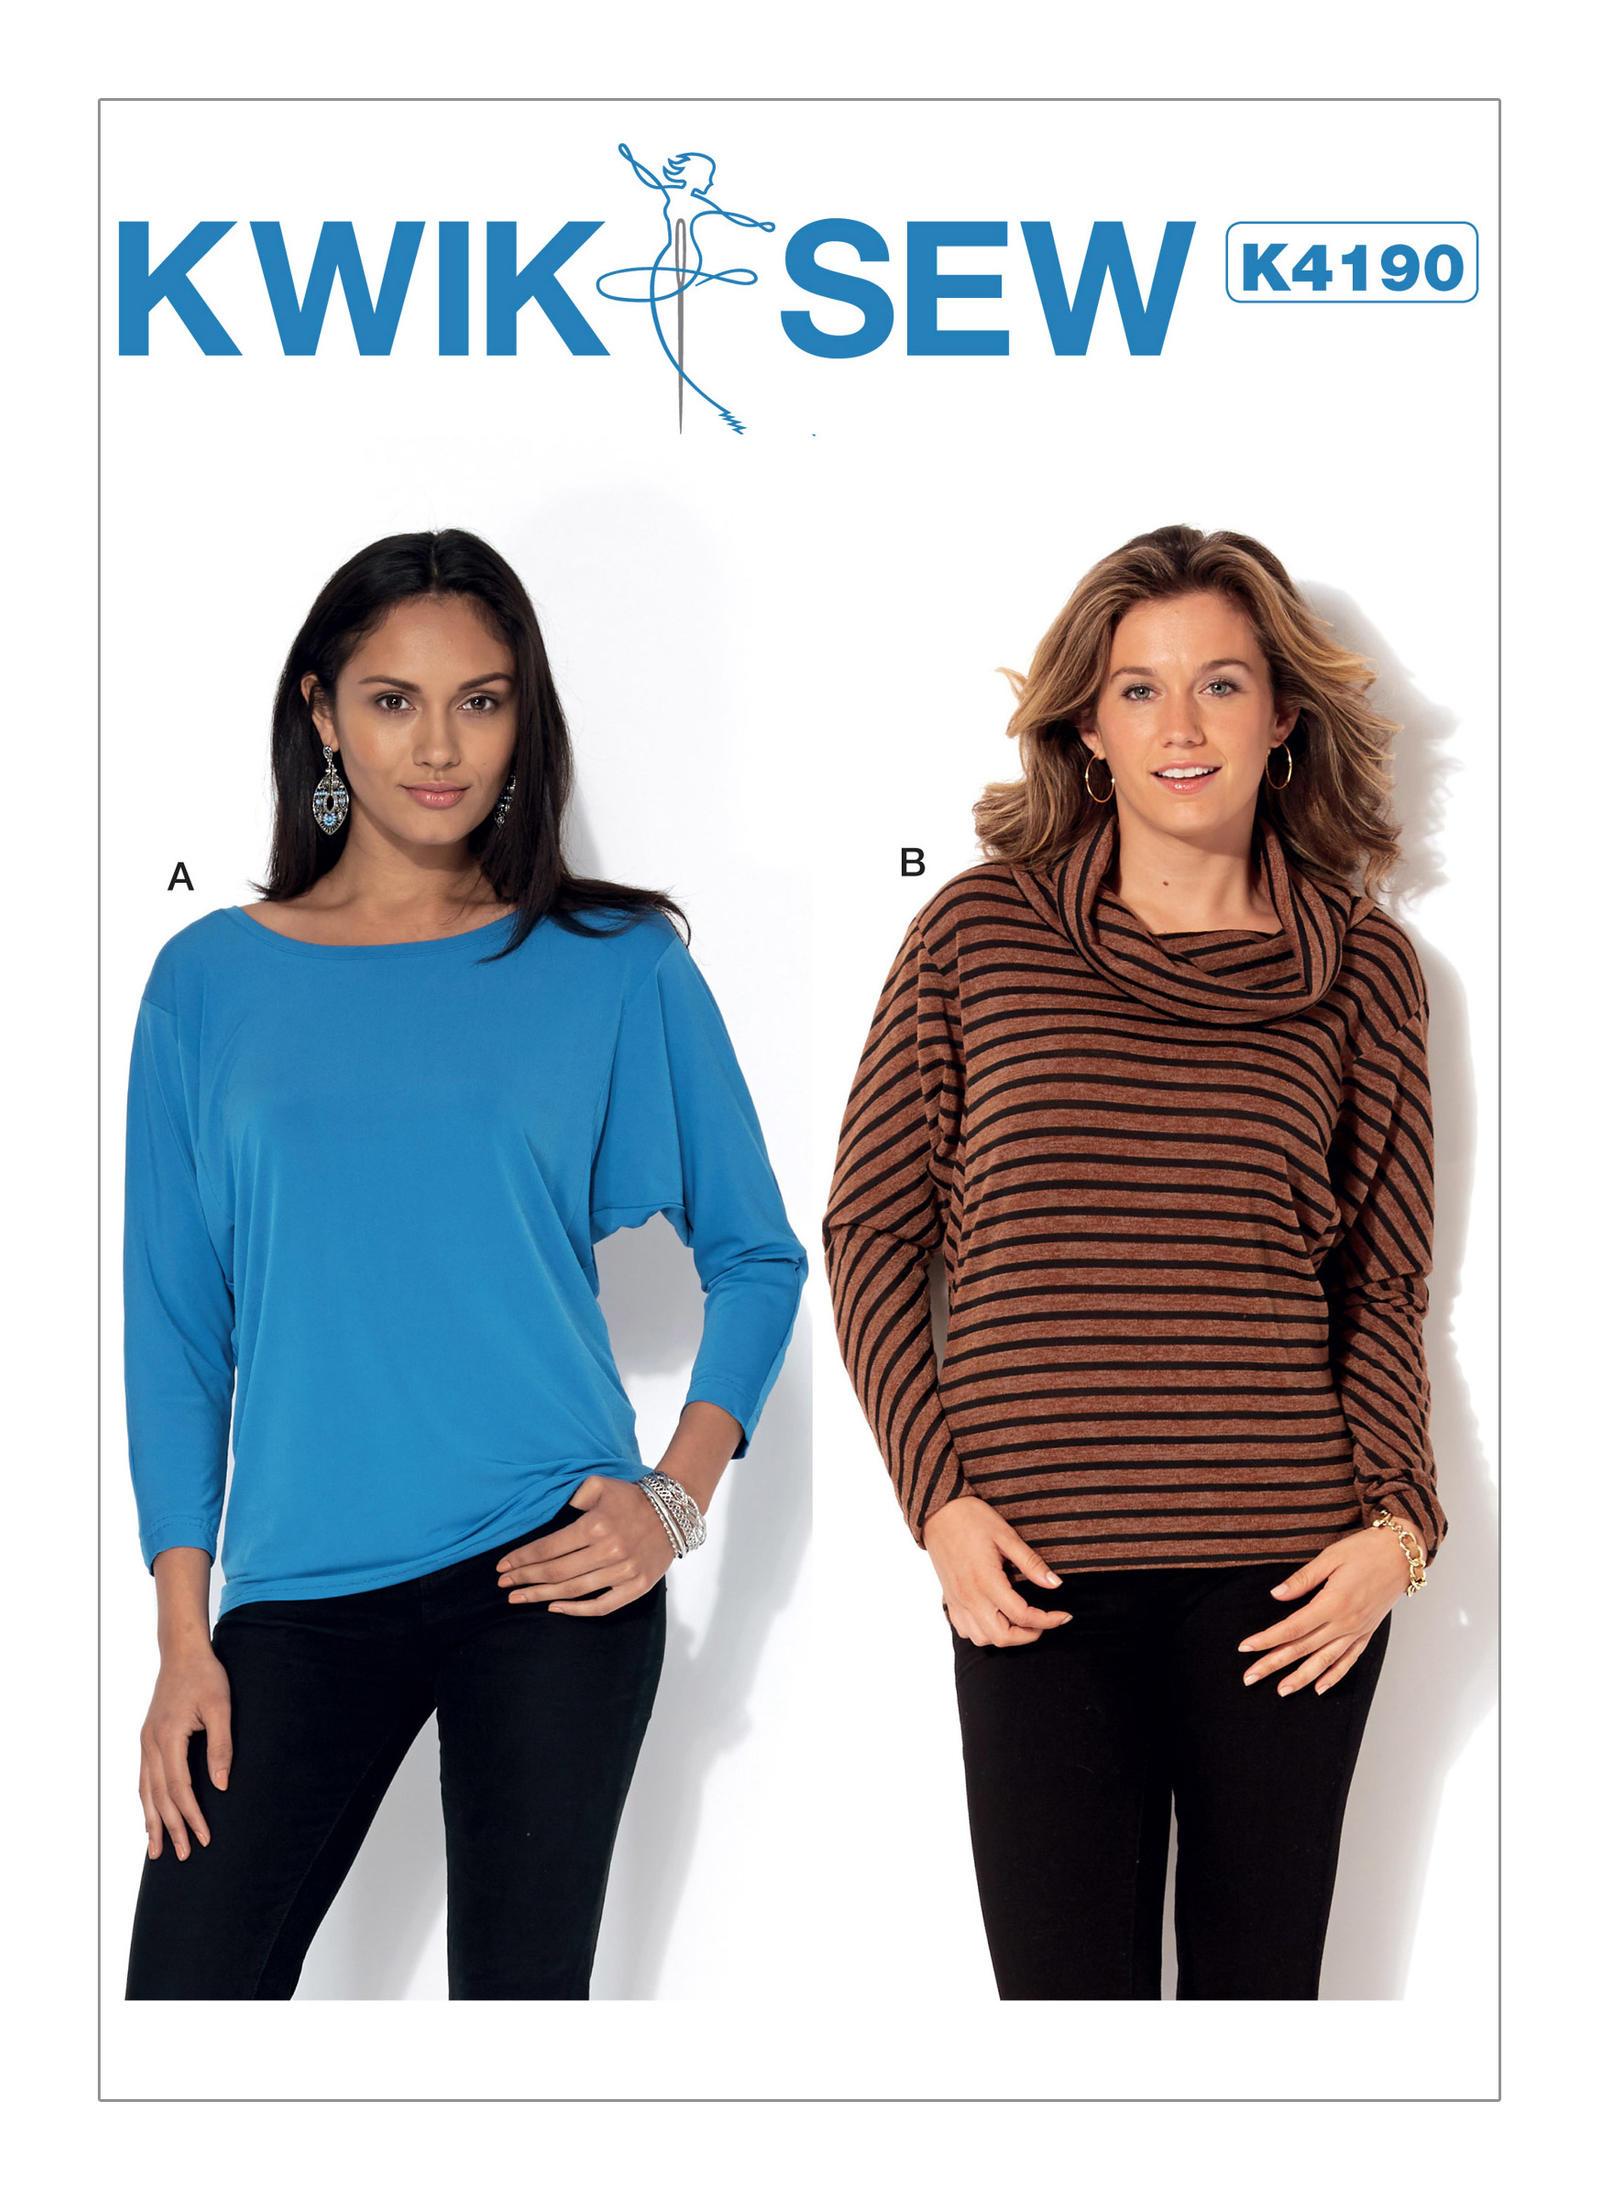 Kwik sew 4190 misses long sleeve batwing tops prevnext jeuxipadfo Choice Image